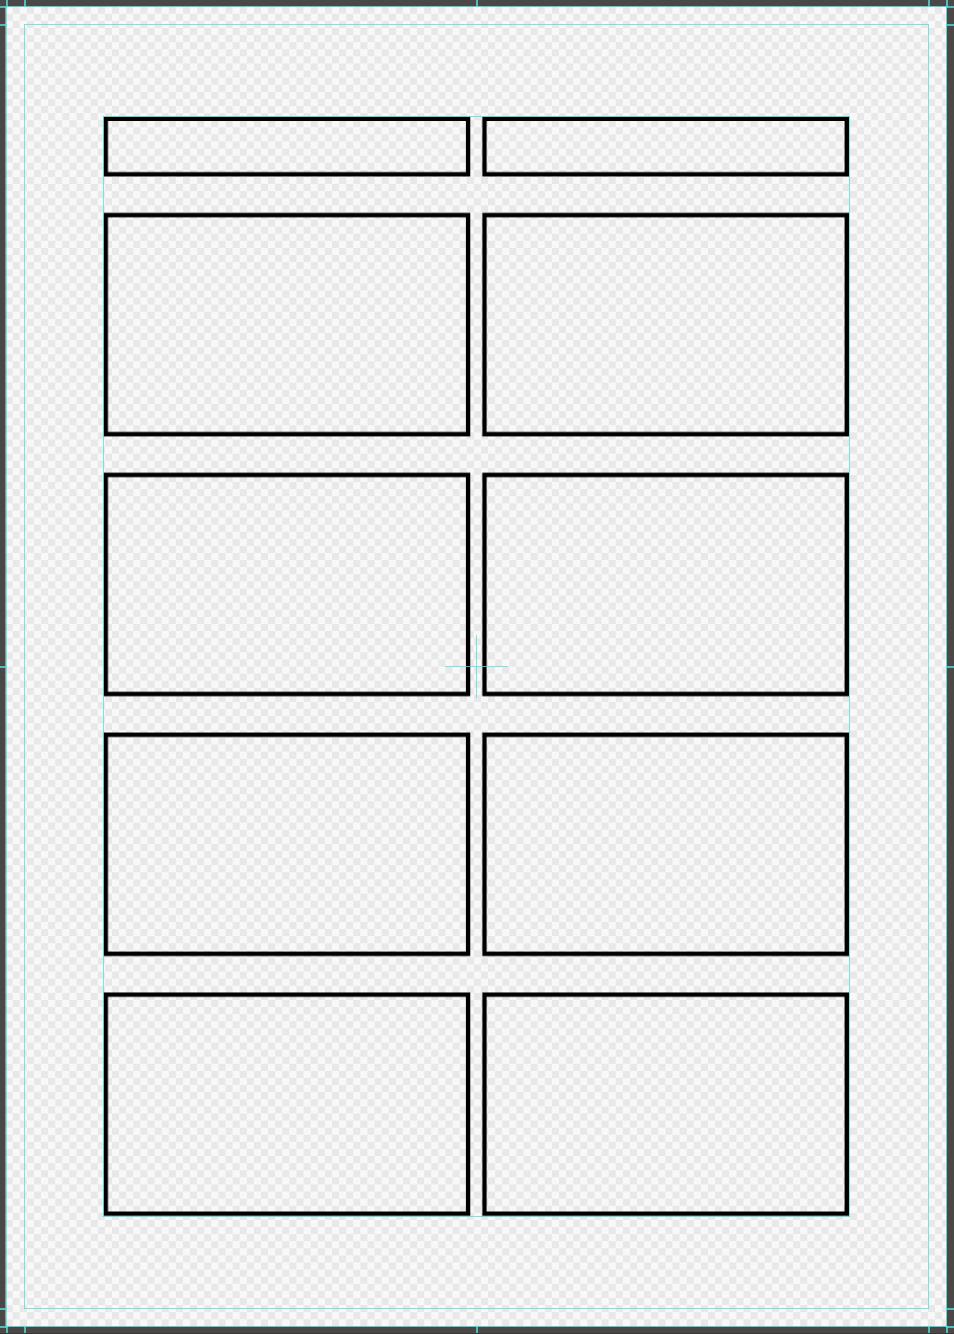 Panel divide for 4-frame cartoon